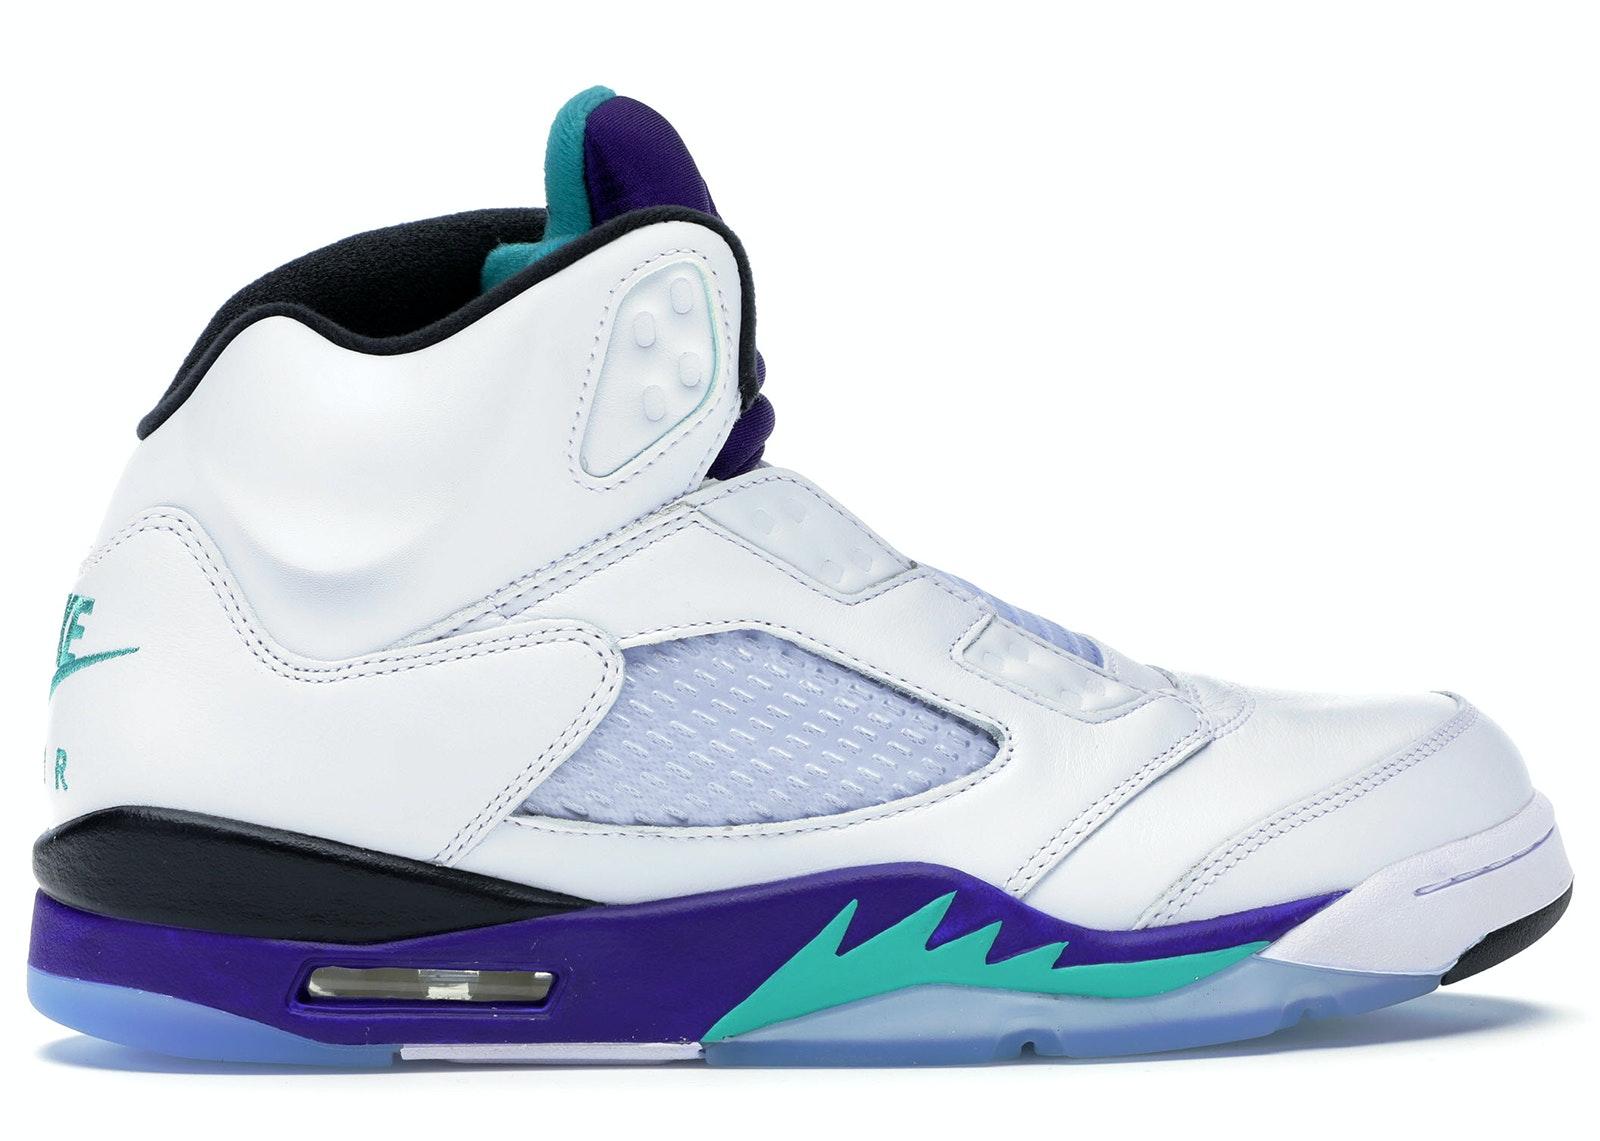 Jordan 5 Retro Grape Fresh Prince